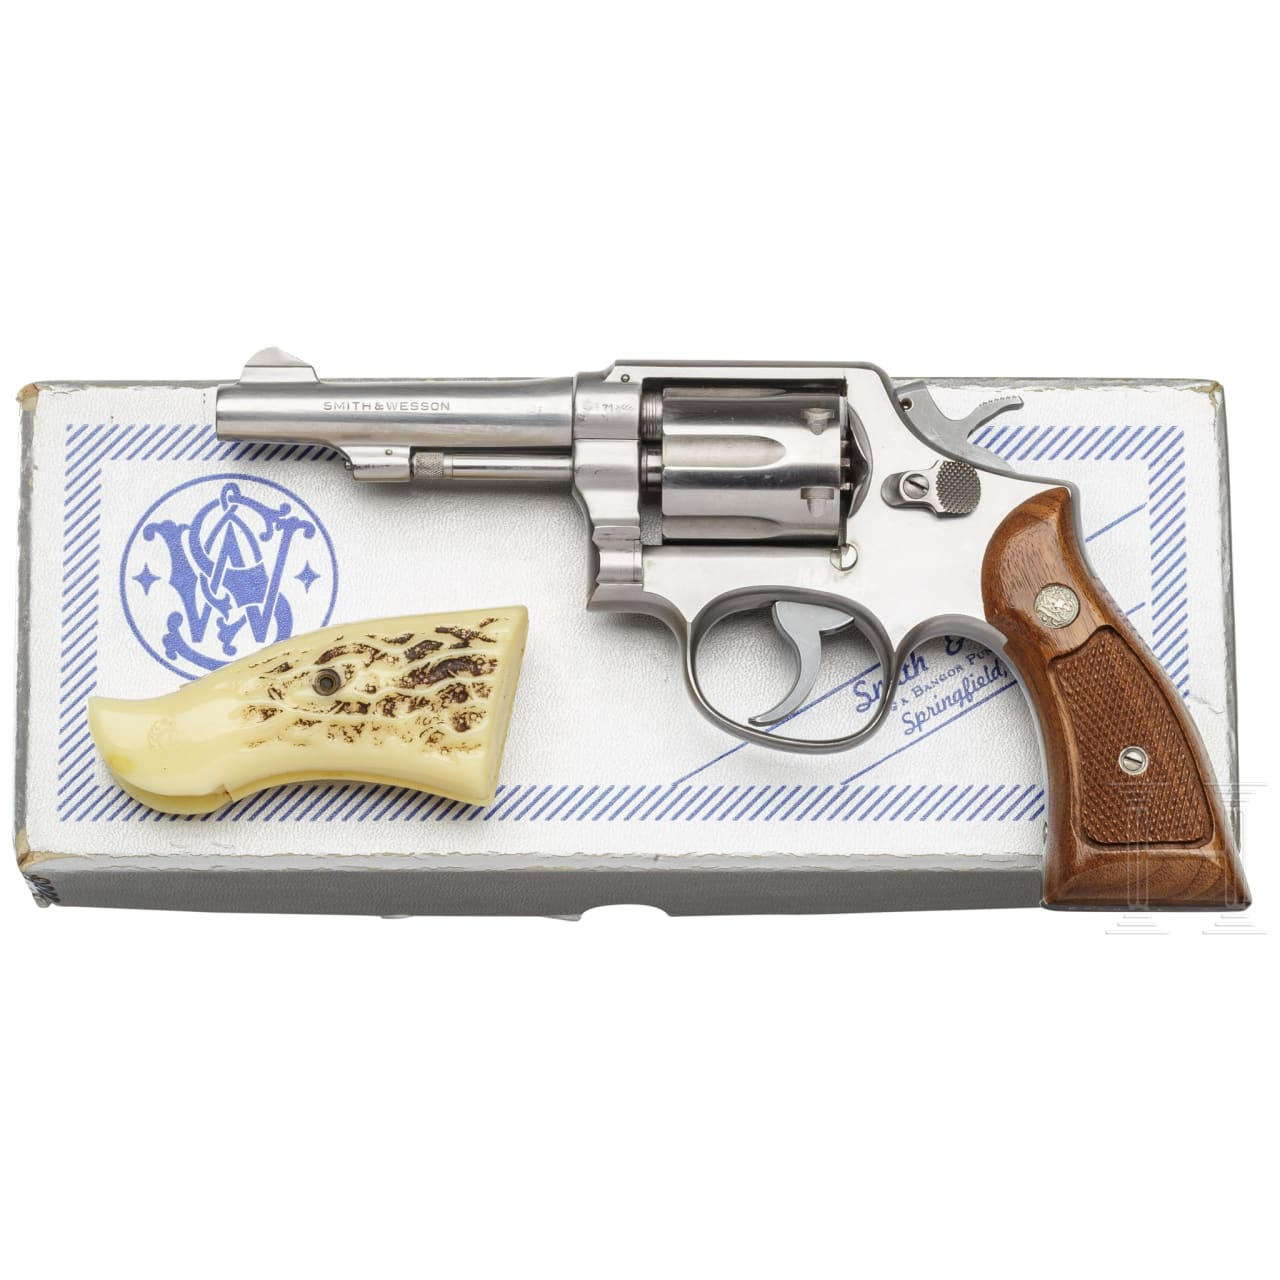 "Smith & Wesson Mod. 64, ""The .38 M & P Stainless"", im Karton"